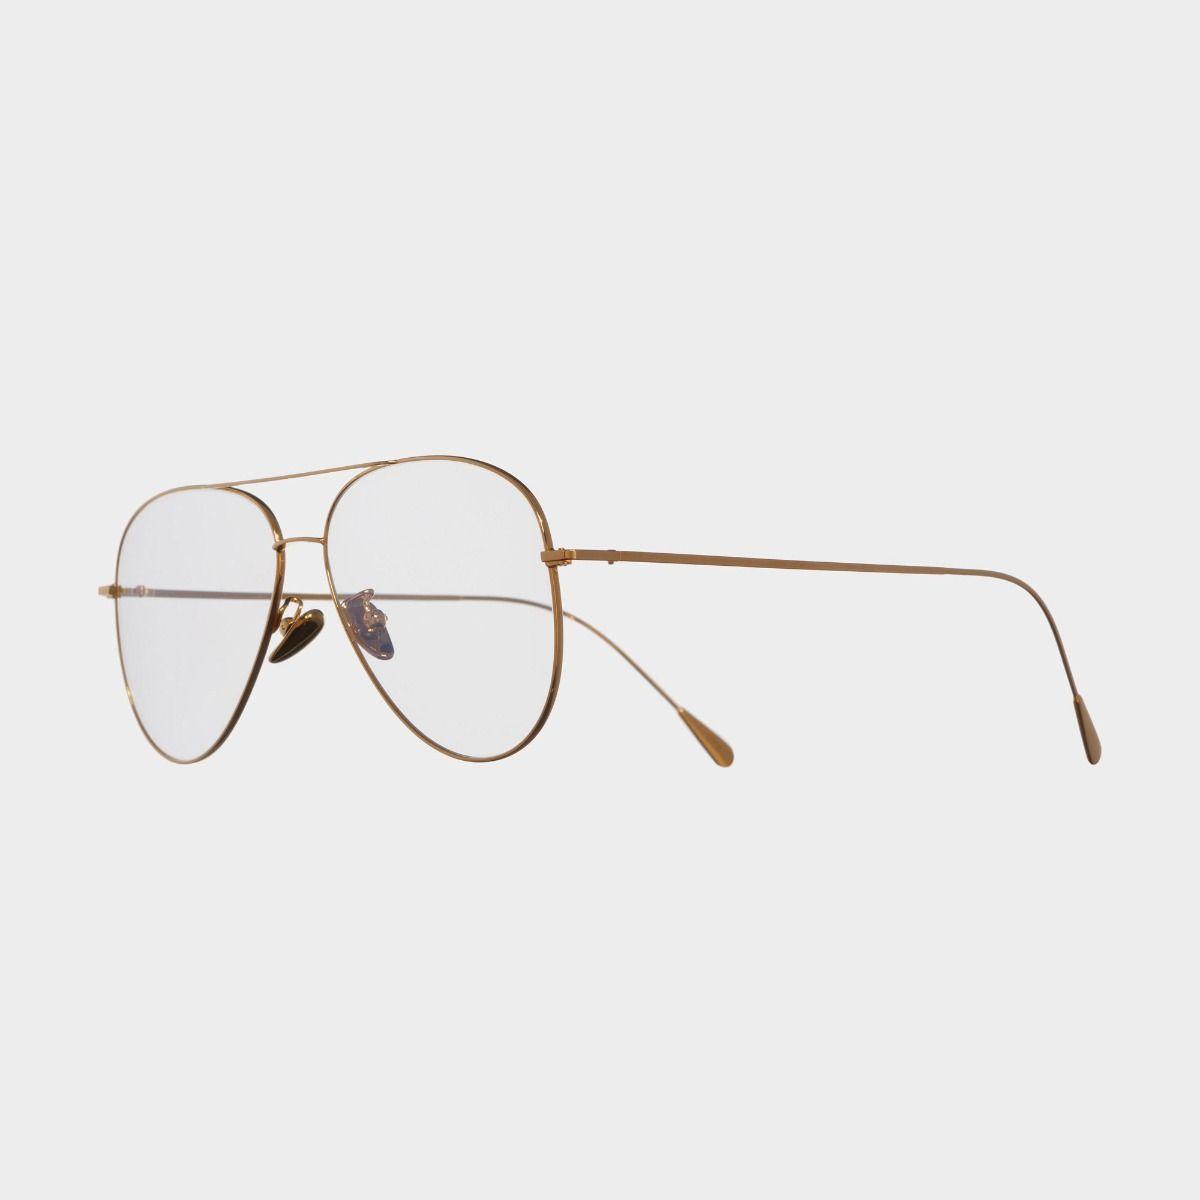 1266 Plated Optical Aviator Glasses